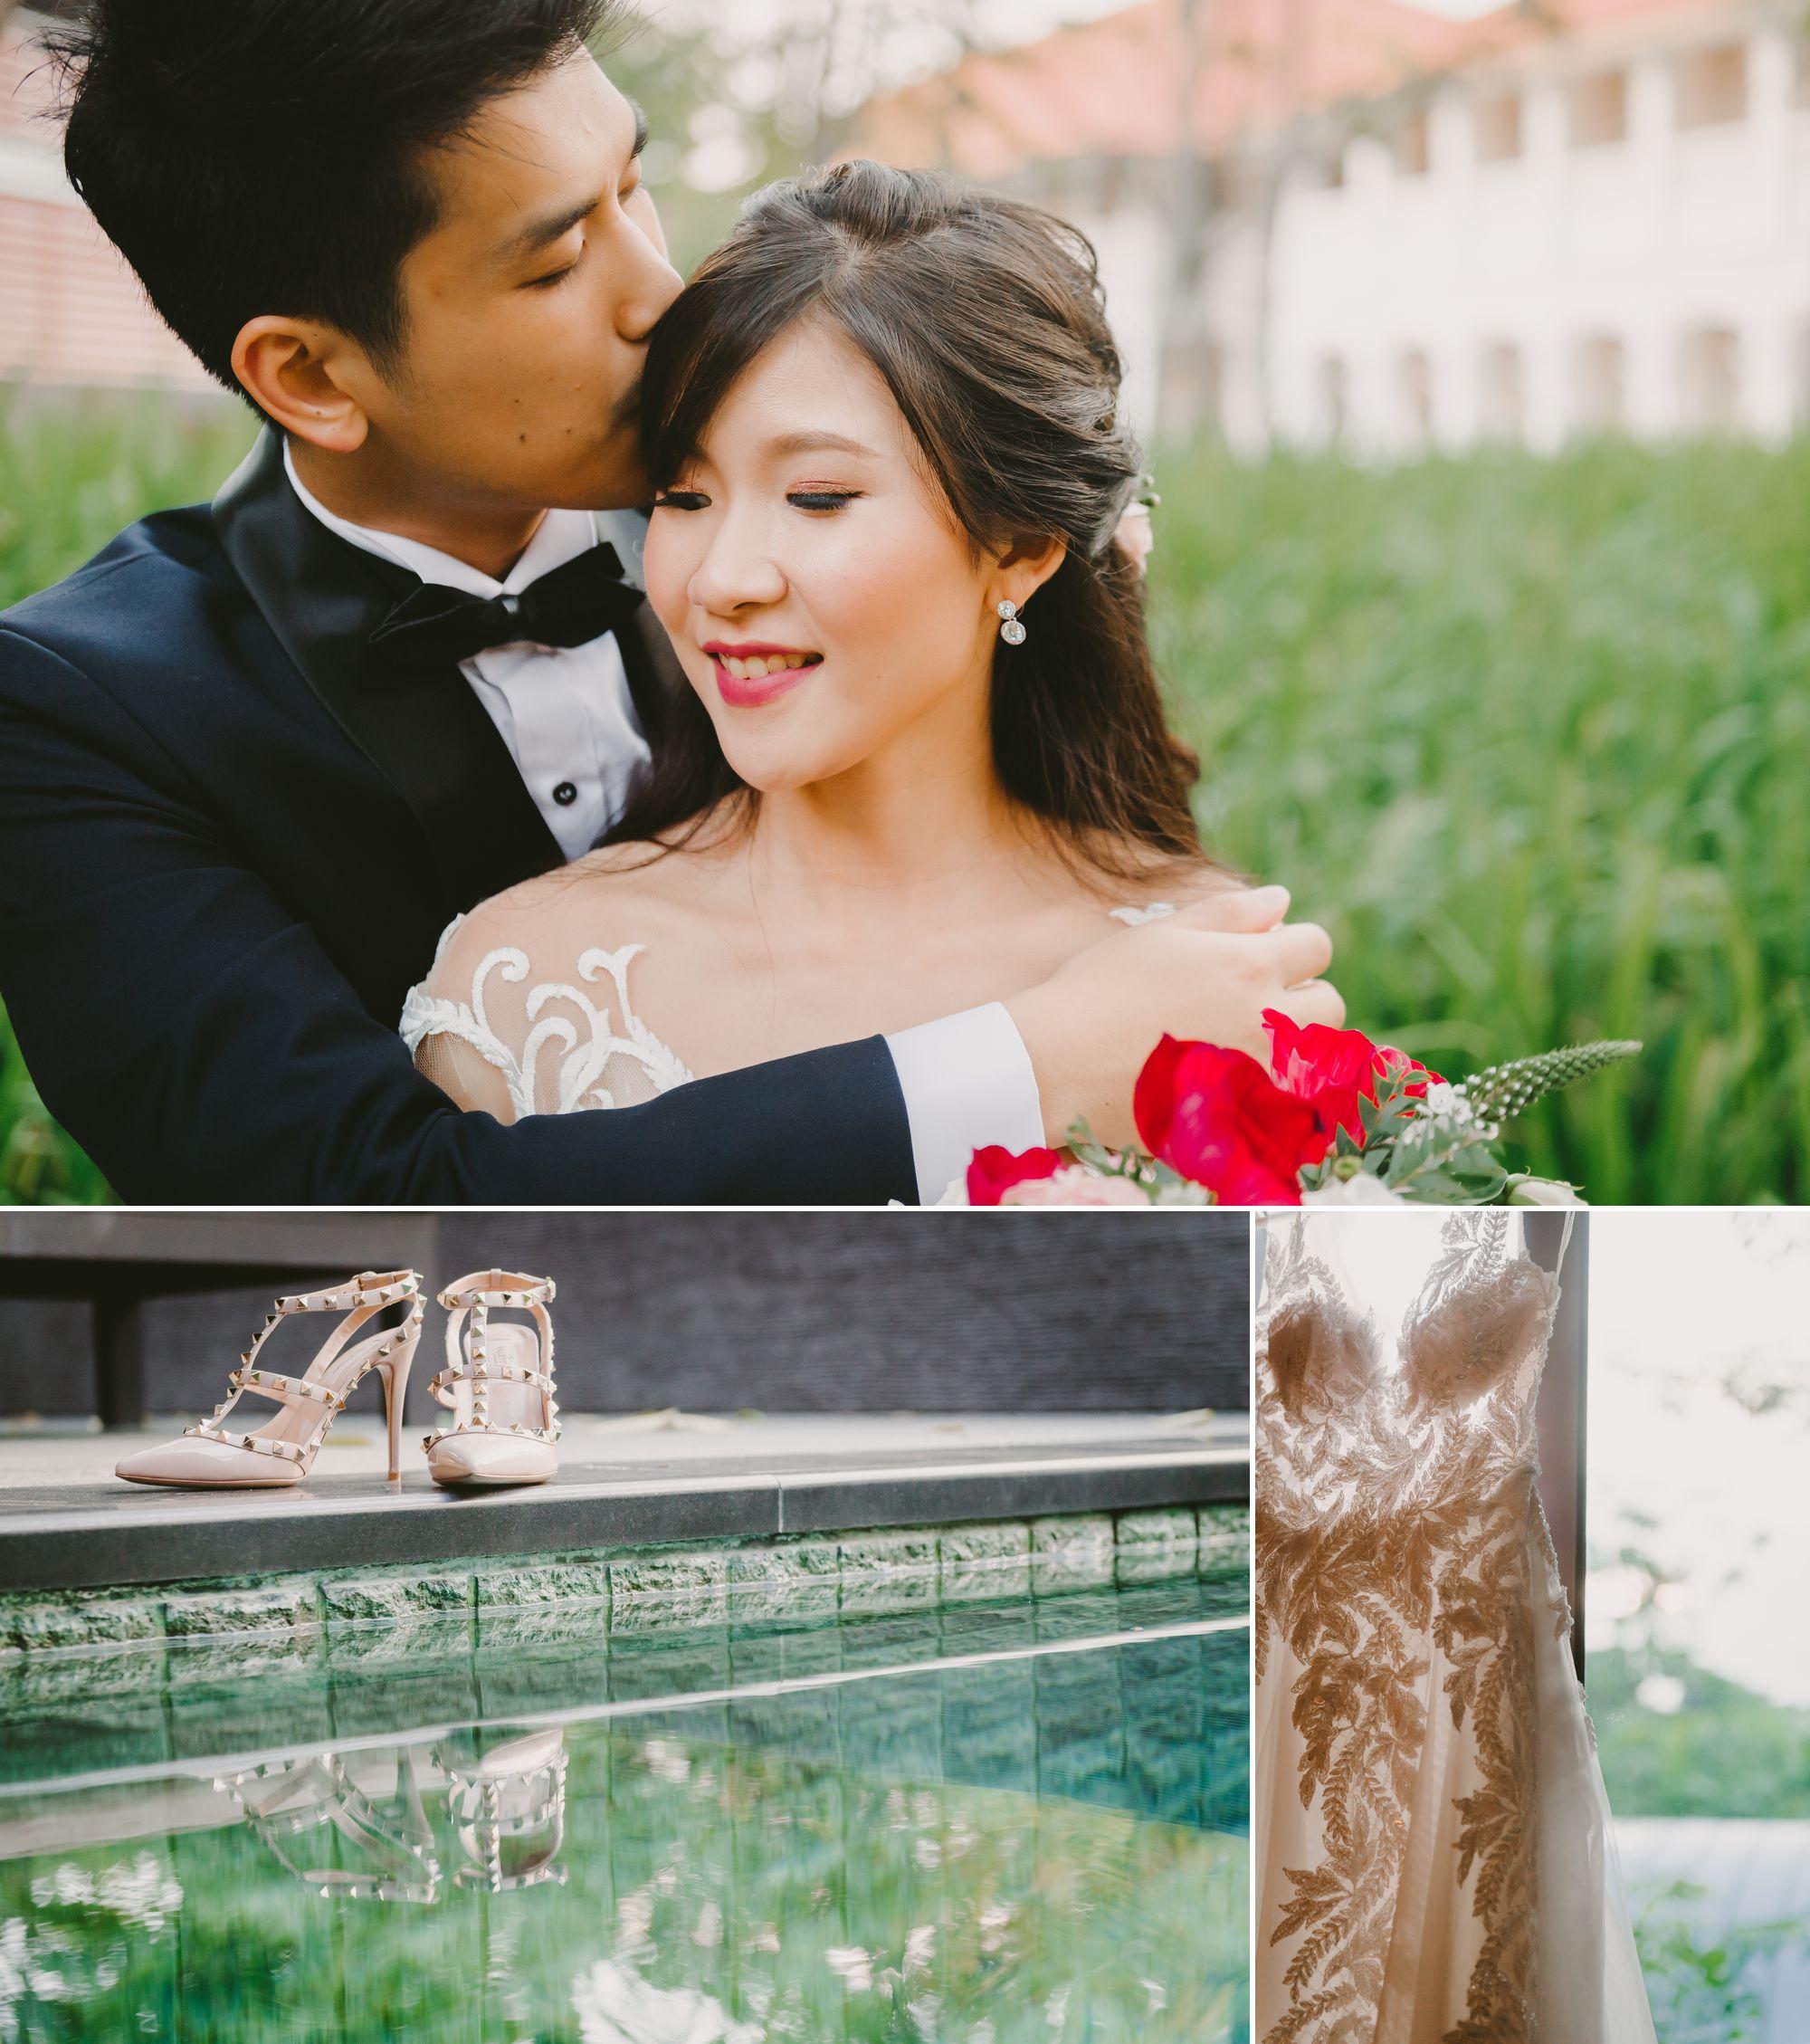 capella_wedding_photography_ 1.jpg